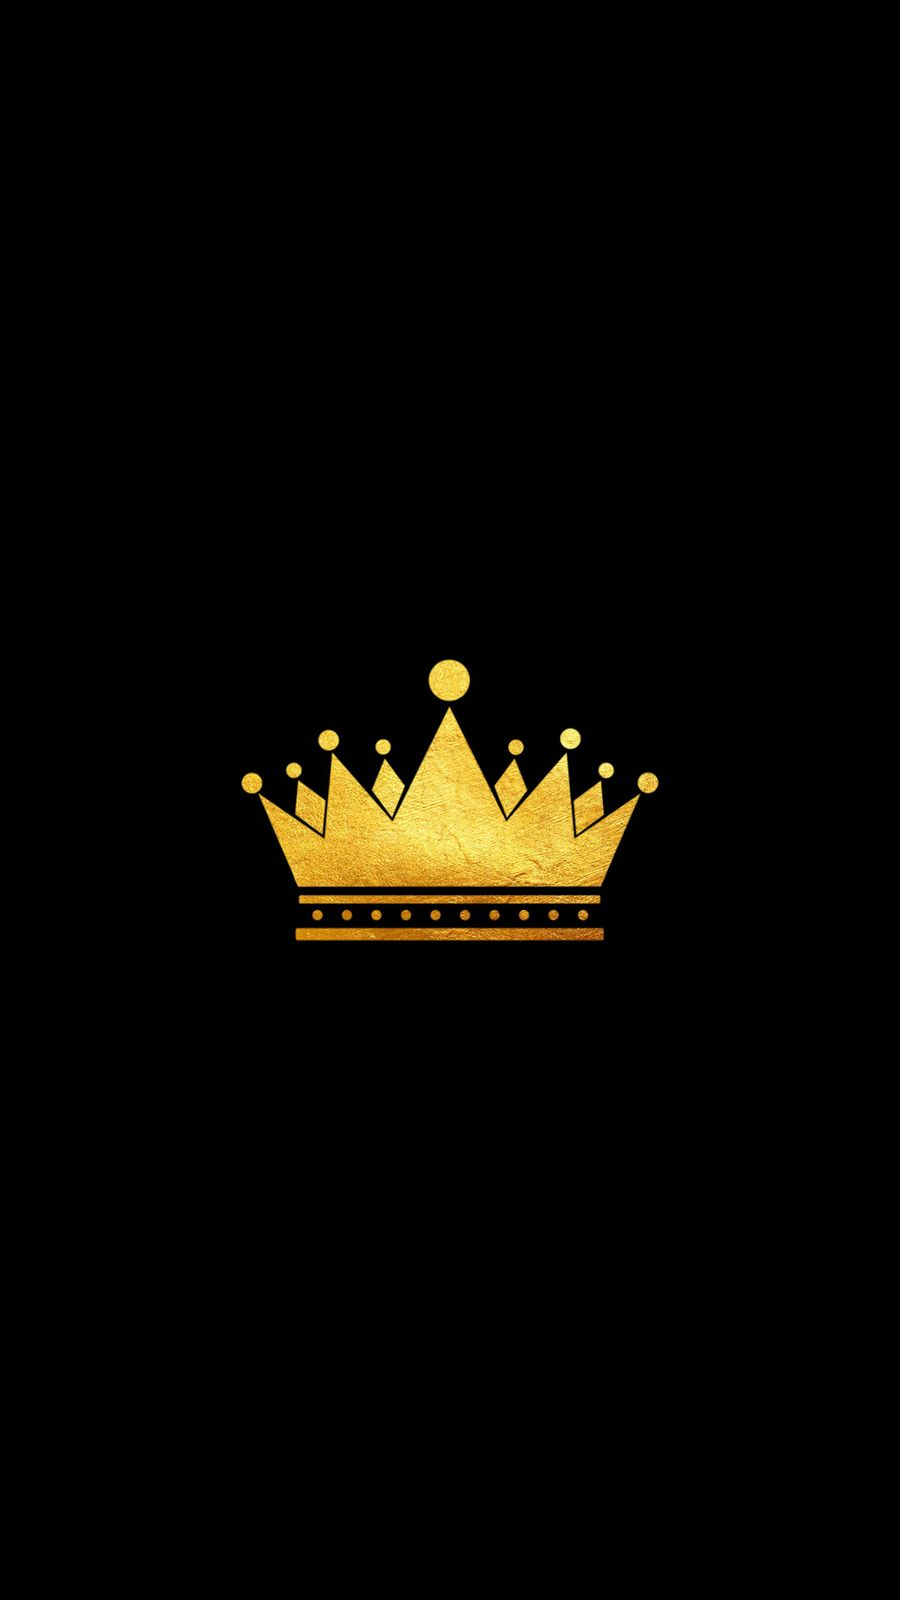 Обои на телефон символ, король, группа, бренды, king group